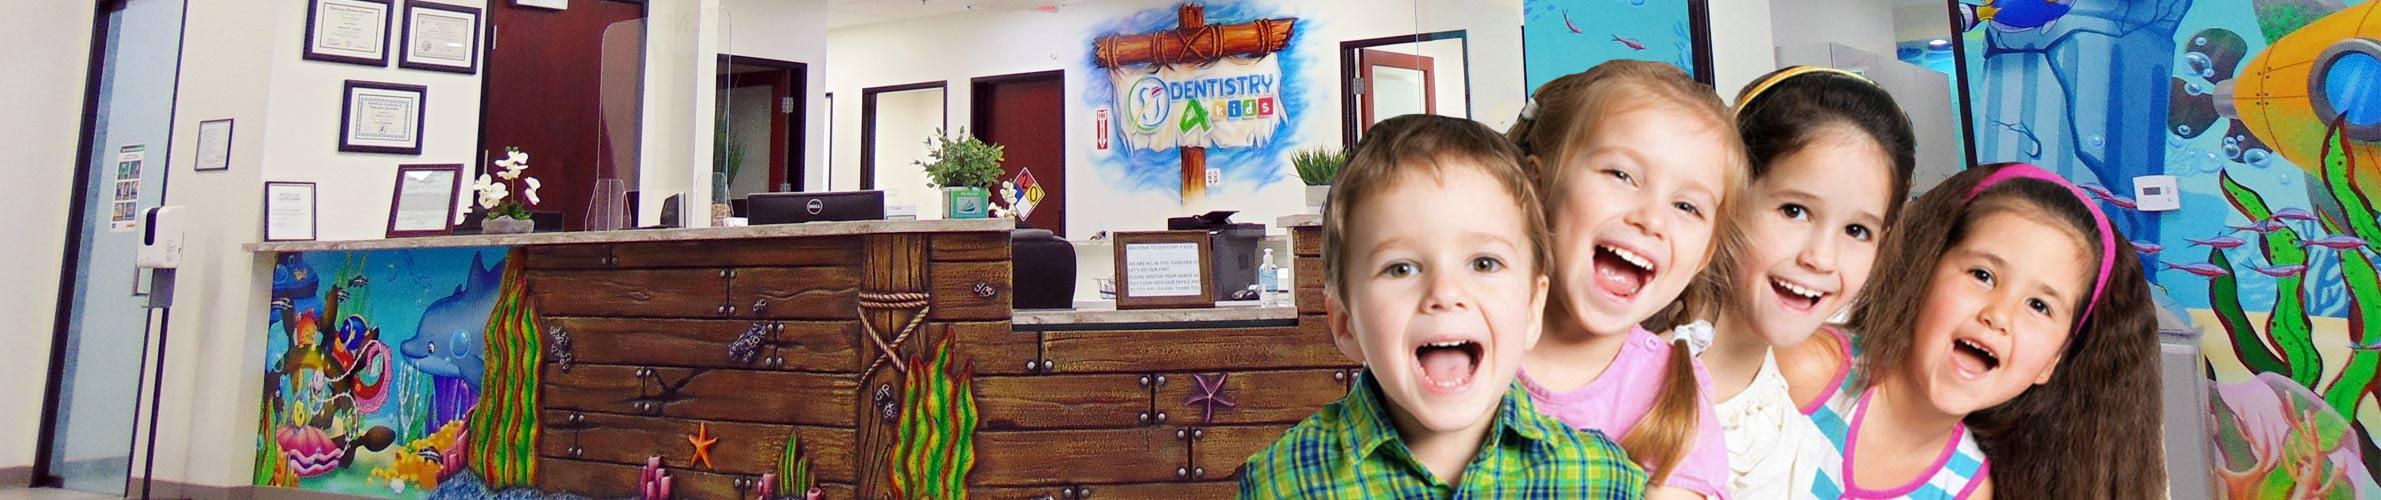 Garden Grove Pediatric Dentist